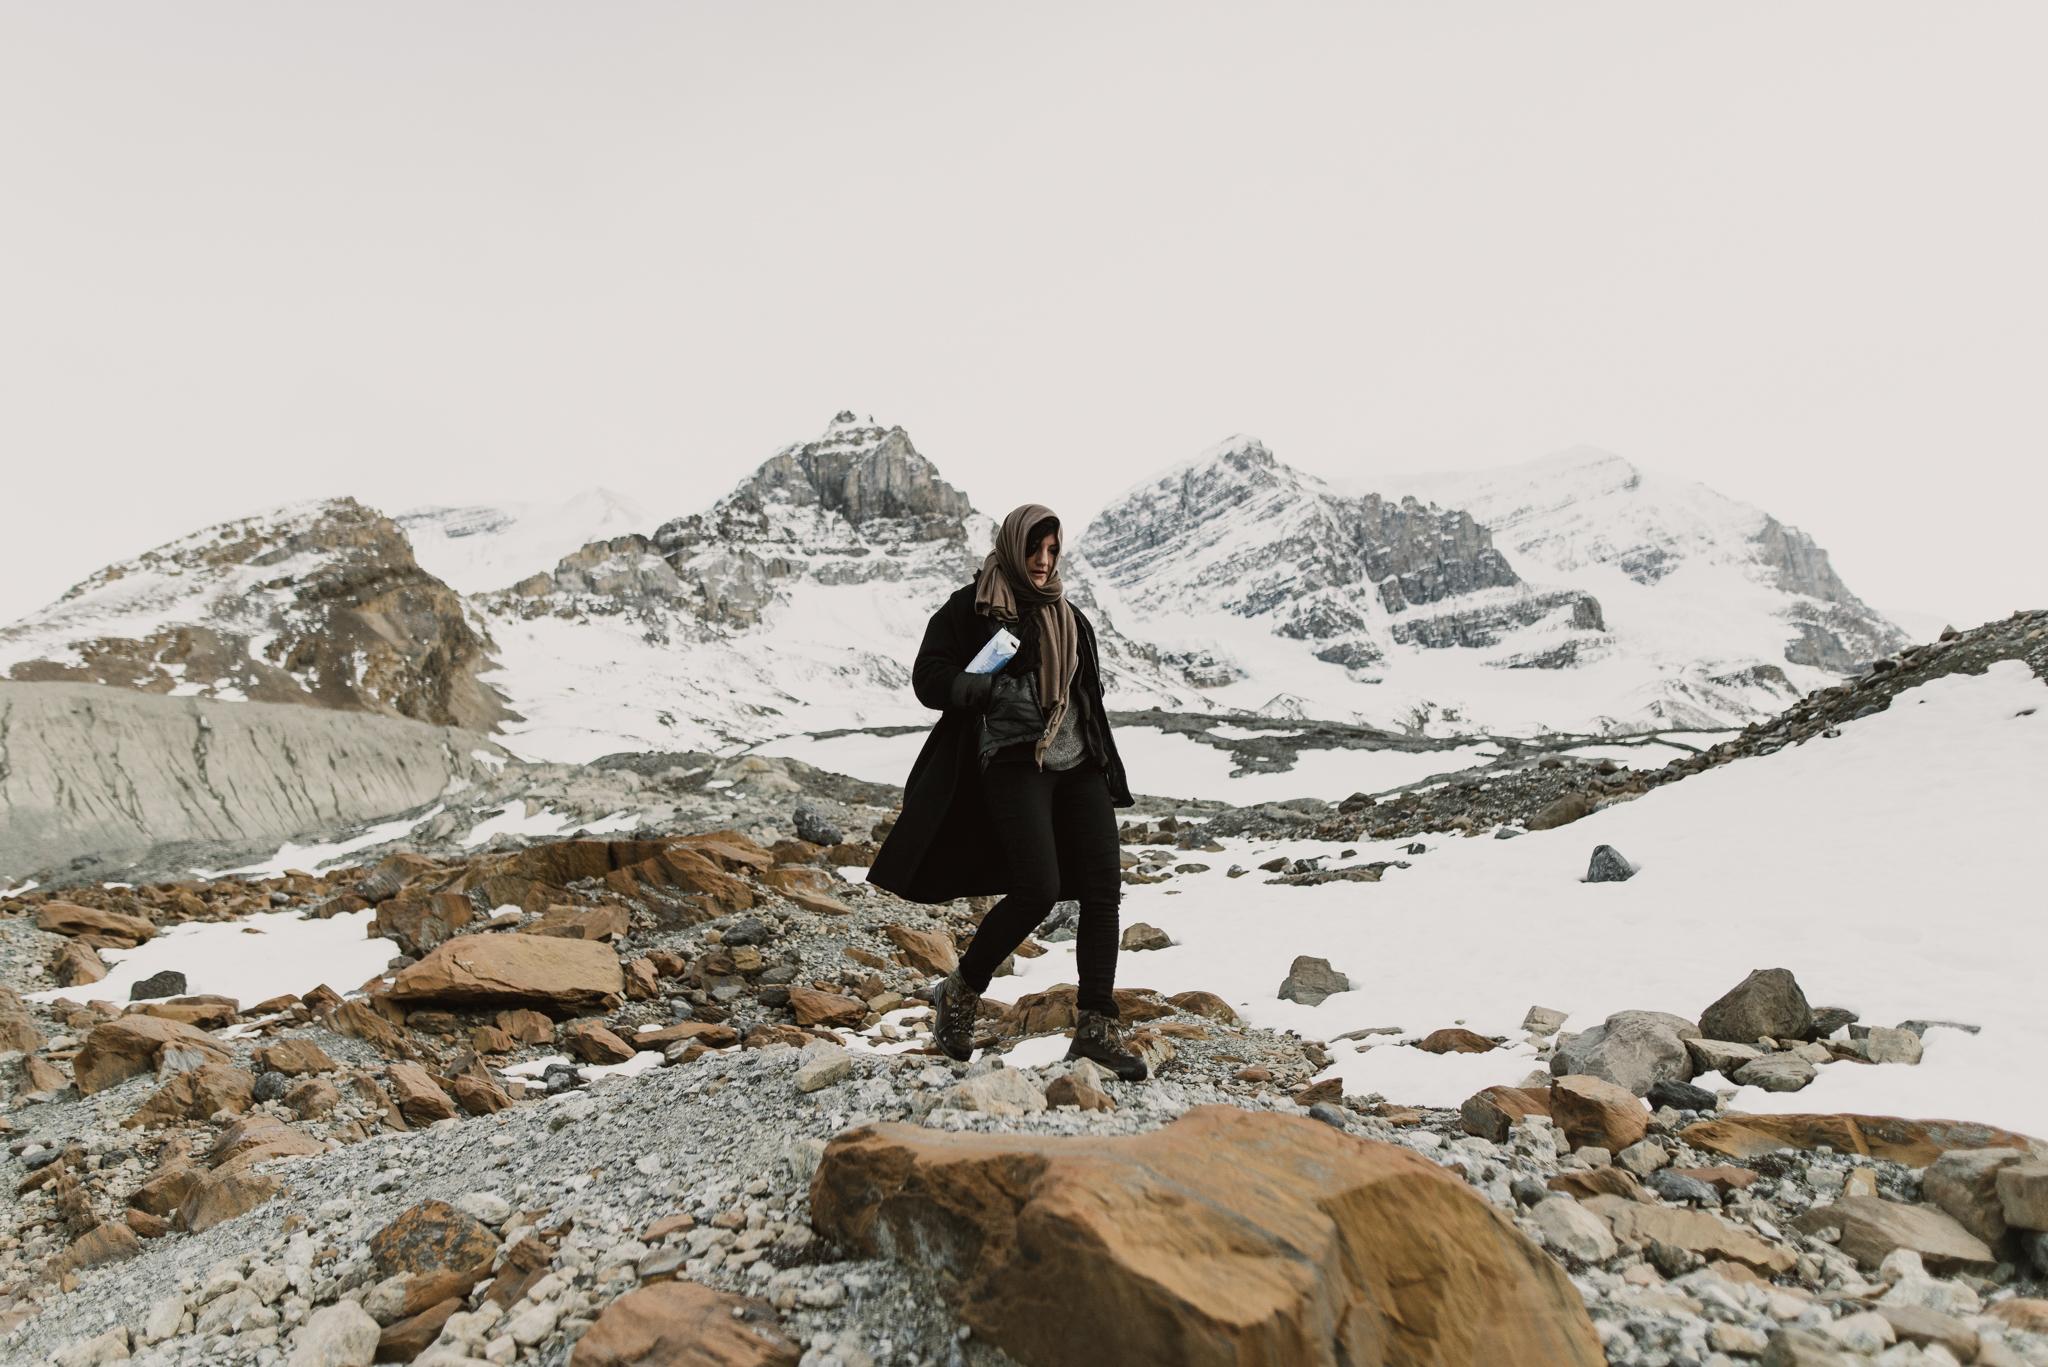 ©The-Ryans-Photo---Athabasca-Glacier,-Ice-Cave-020.jpg